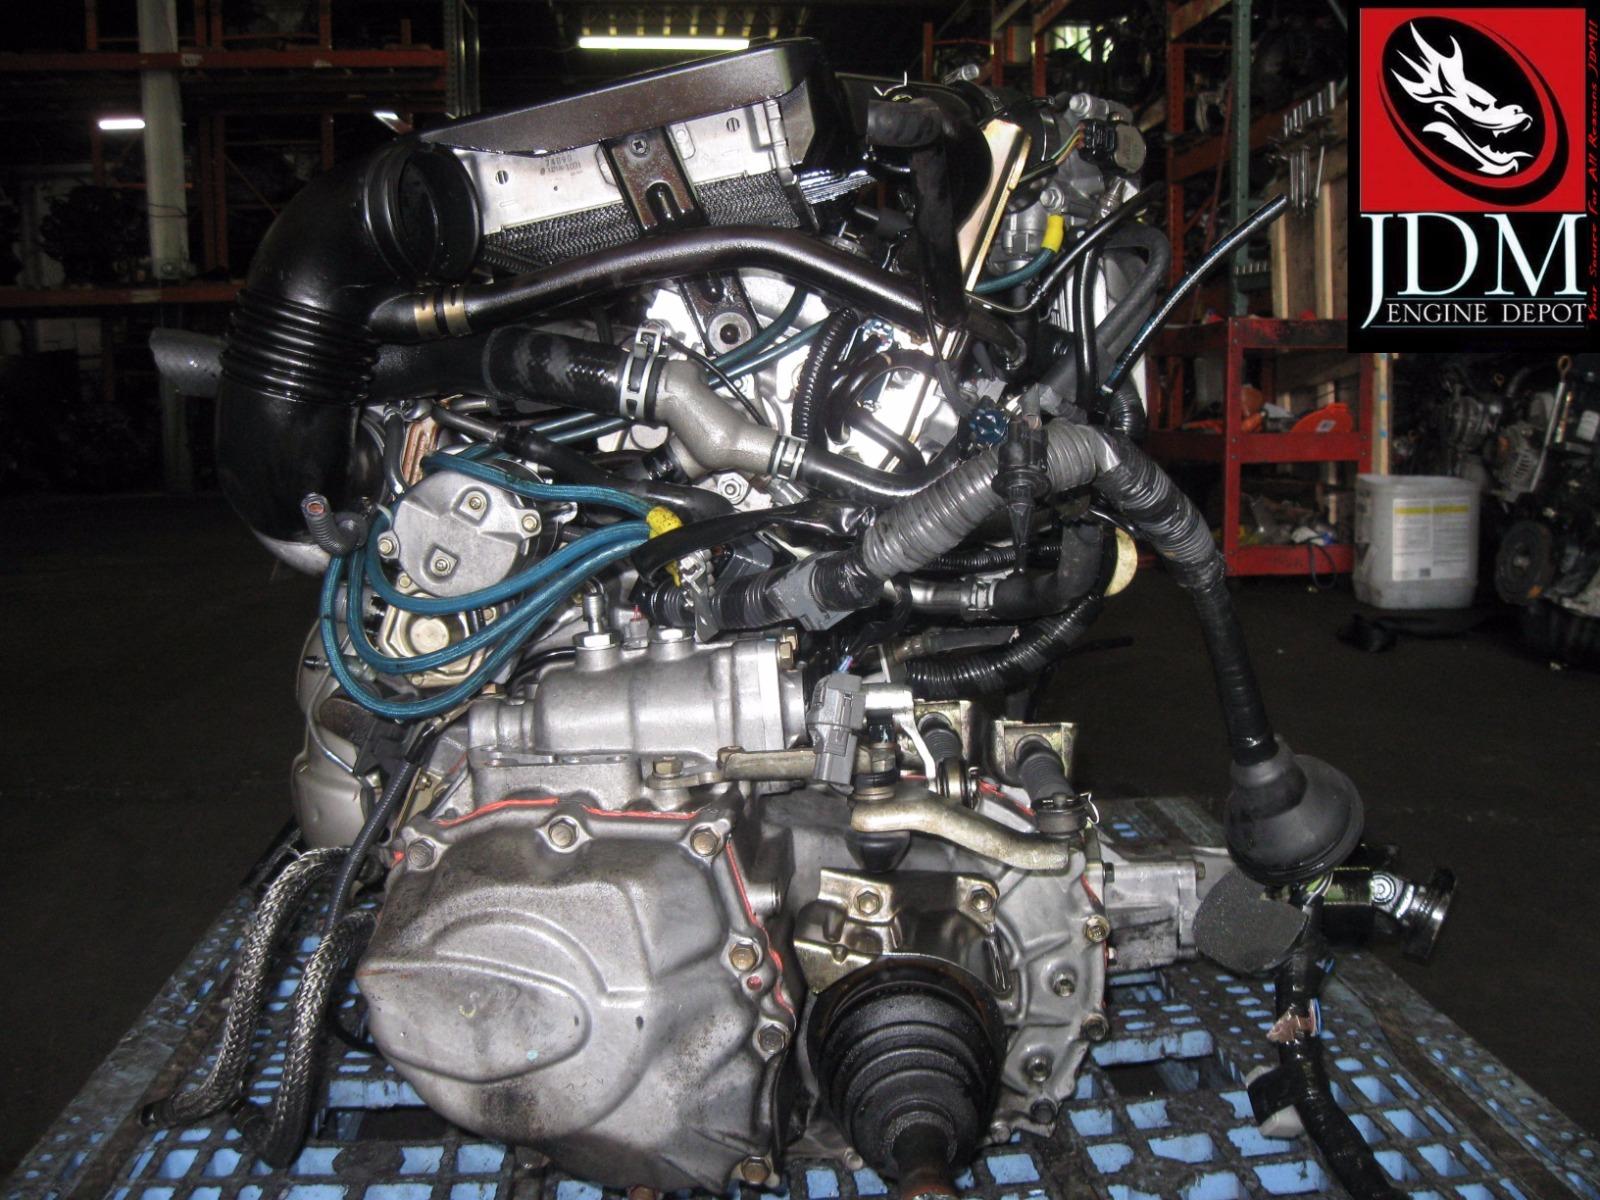 3sgte st215 wiring diagram 2006 hayabusa 98 03 toyota caldina turbo engine manual awd trans